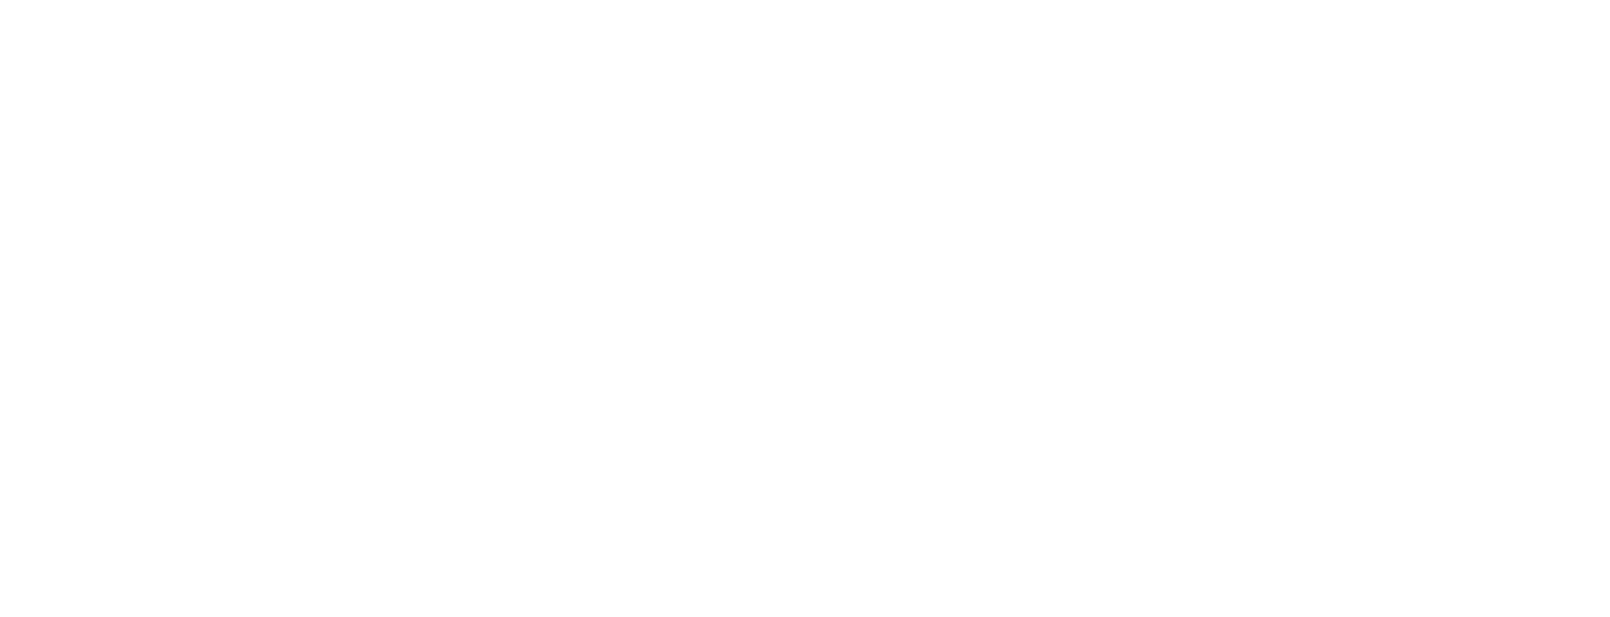 Giovanni Orlando Guida Alpina UIAGM Dolomiti